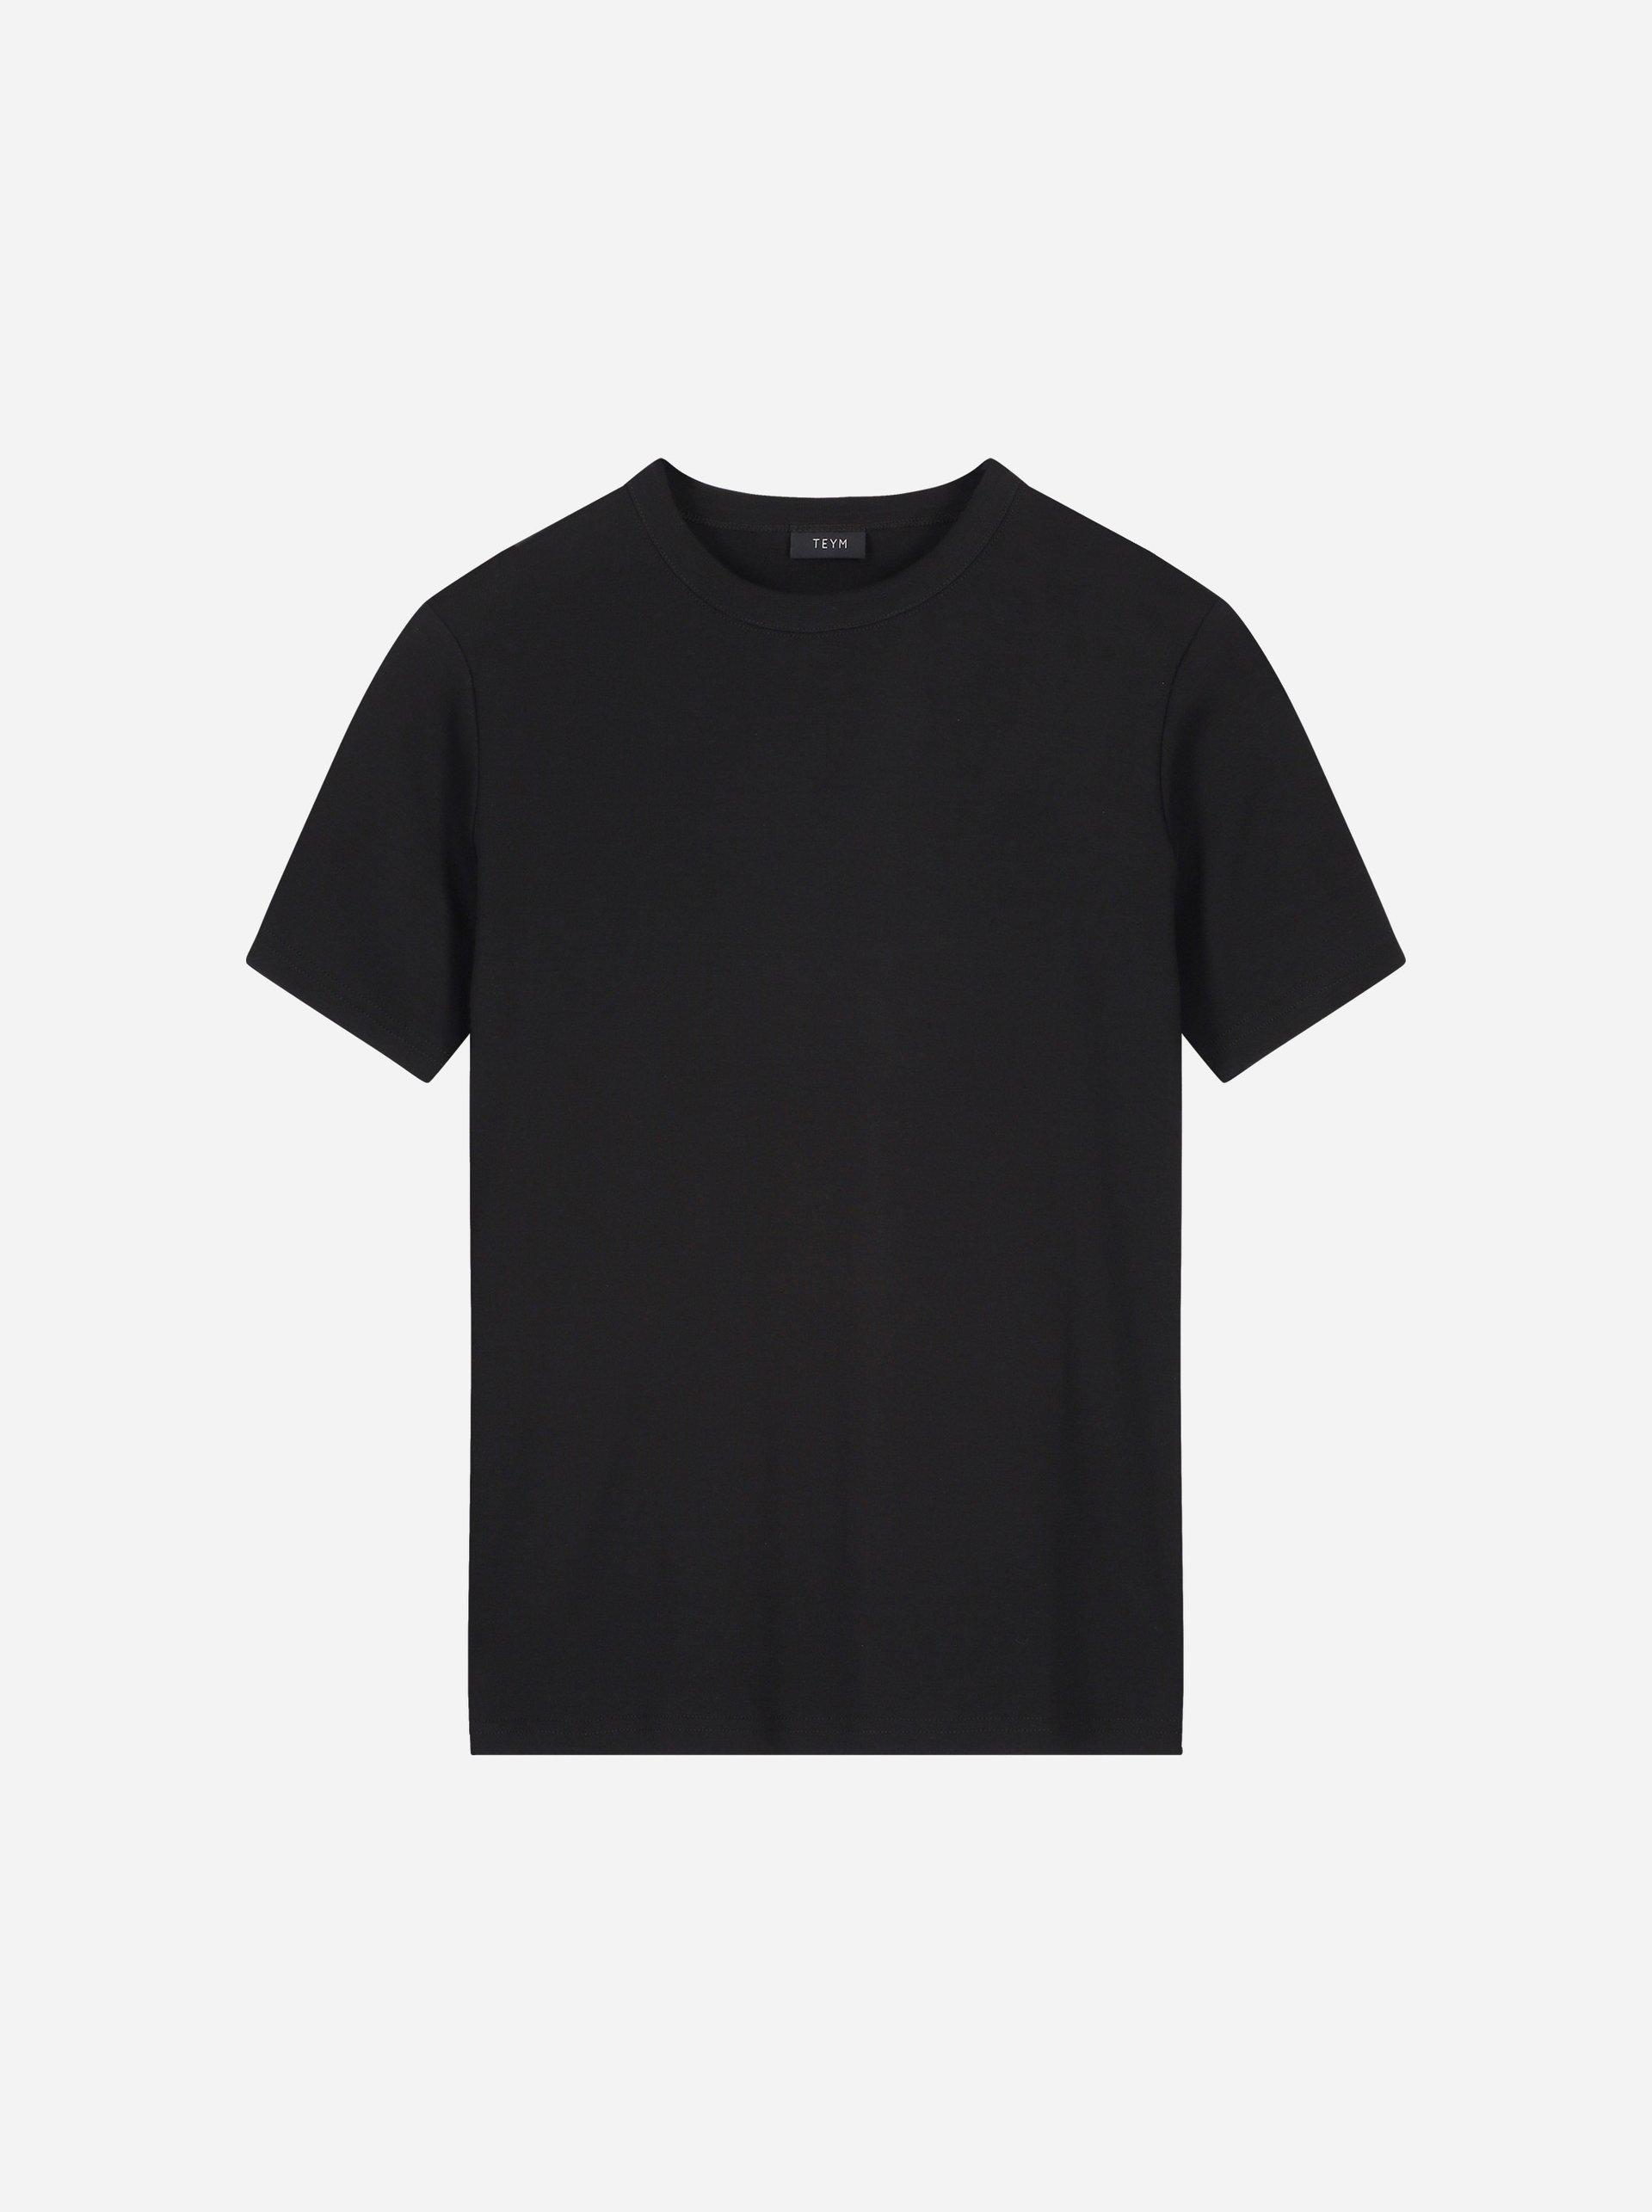 Teym - The T-Shirt - Women - Black5